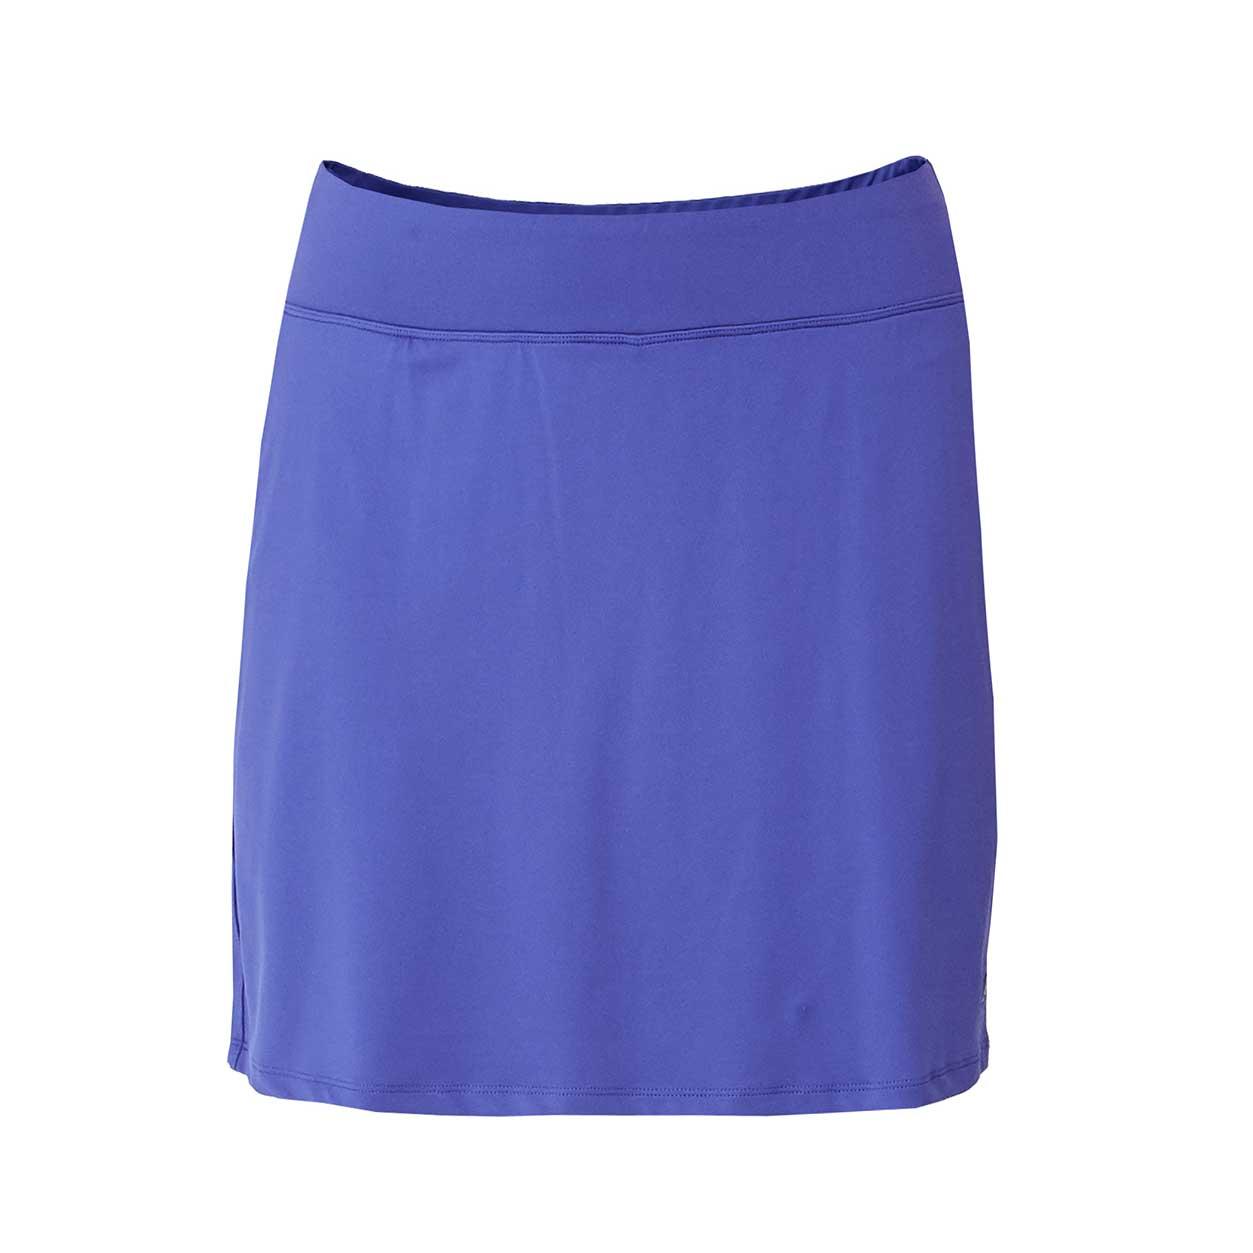 Lija Women's Elite Tuxedo Blue Skort